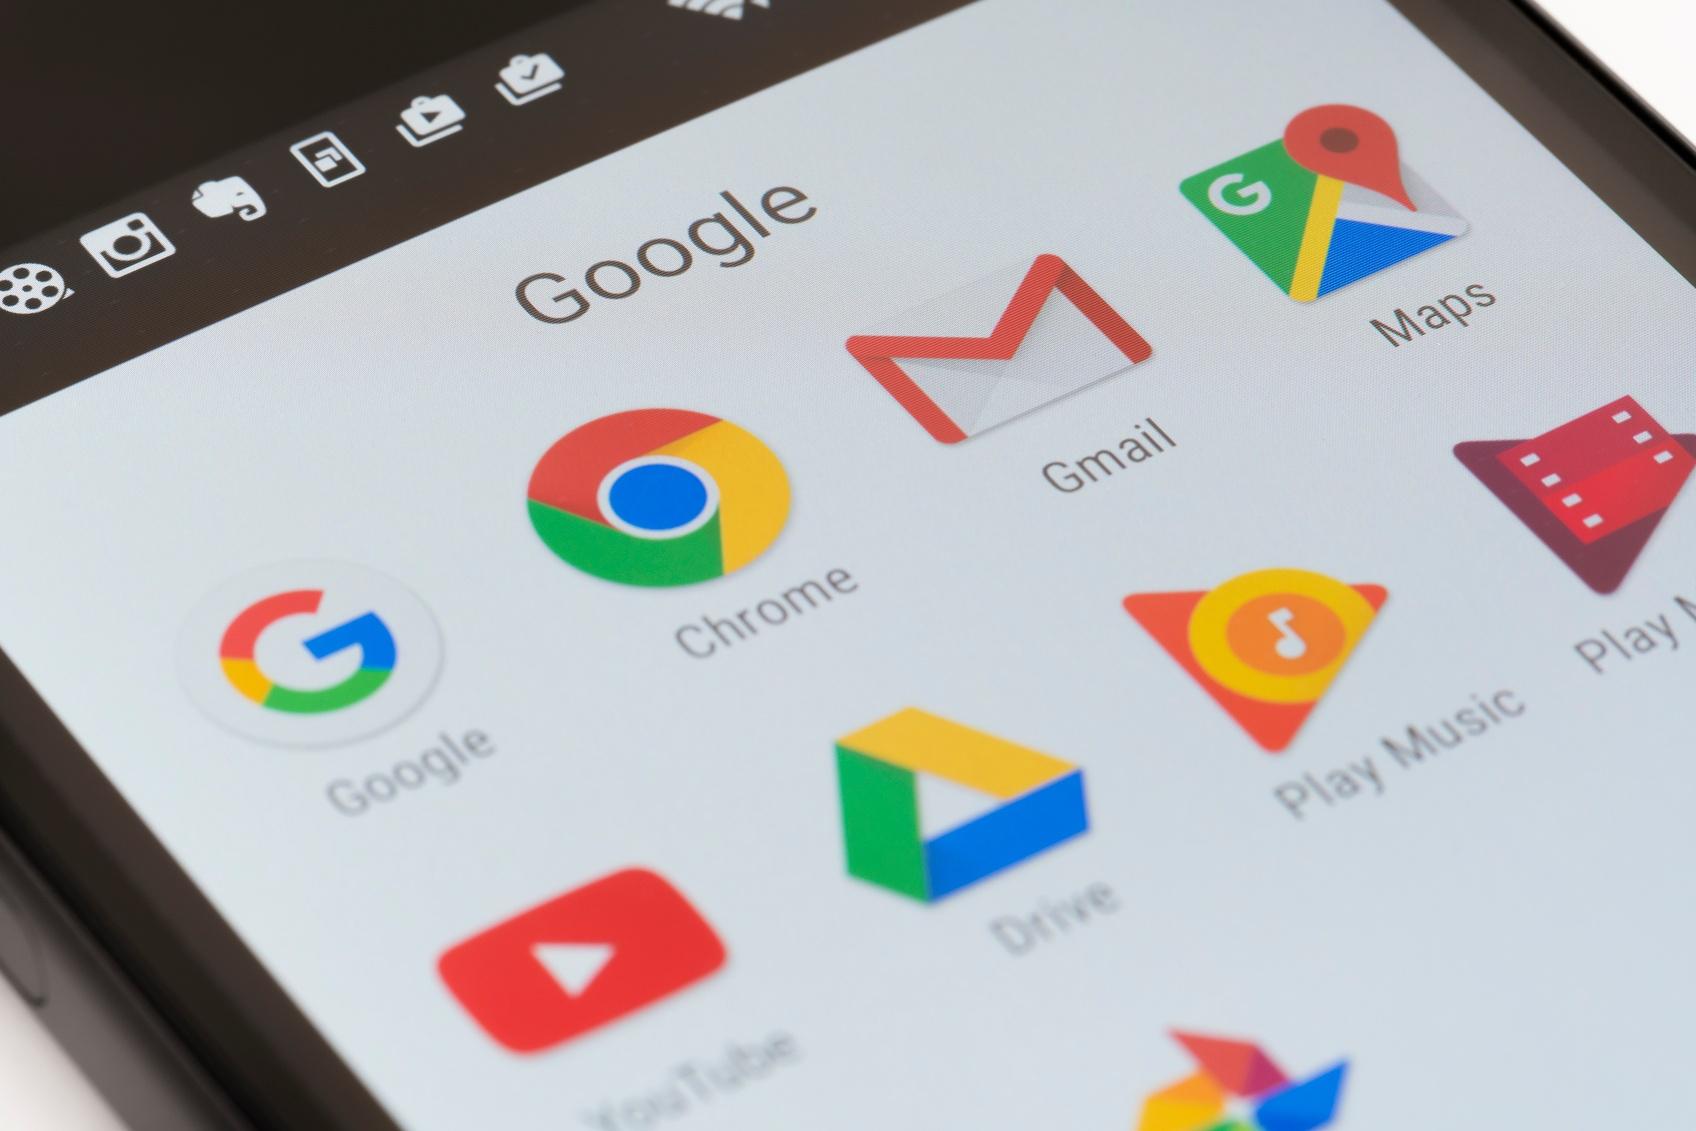 Google-apps-on-Android-phone-000094432329_Medium.jpg